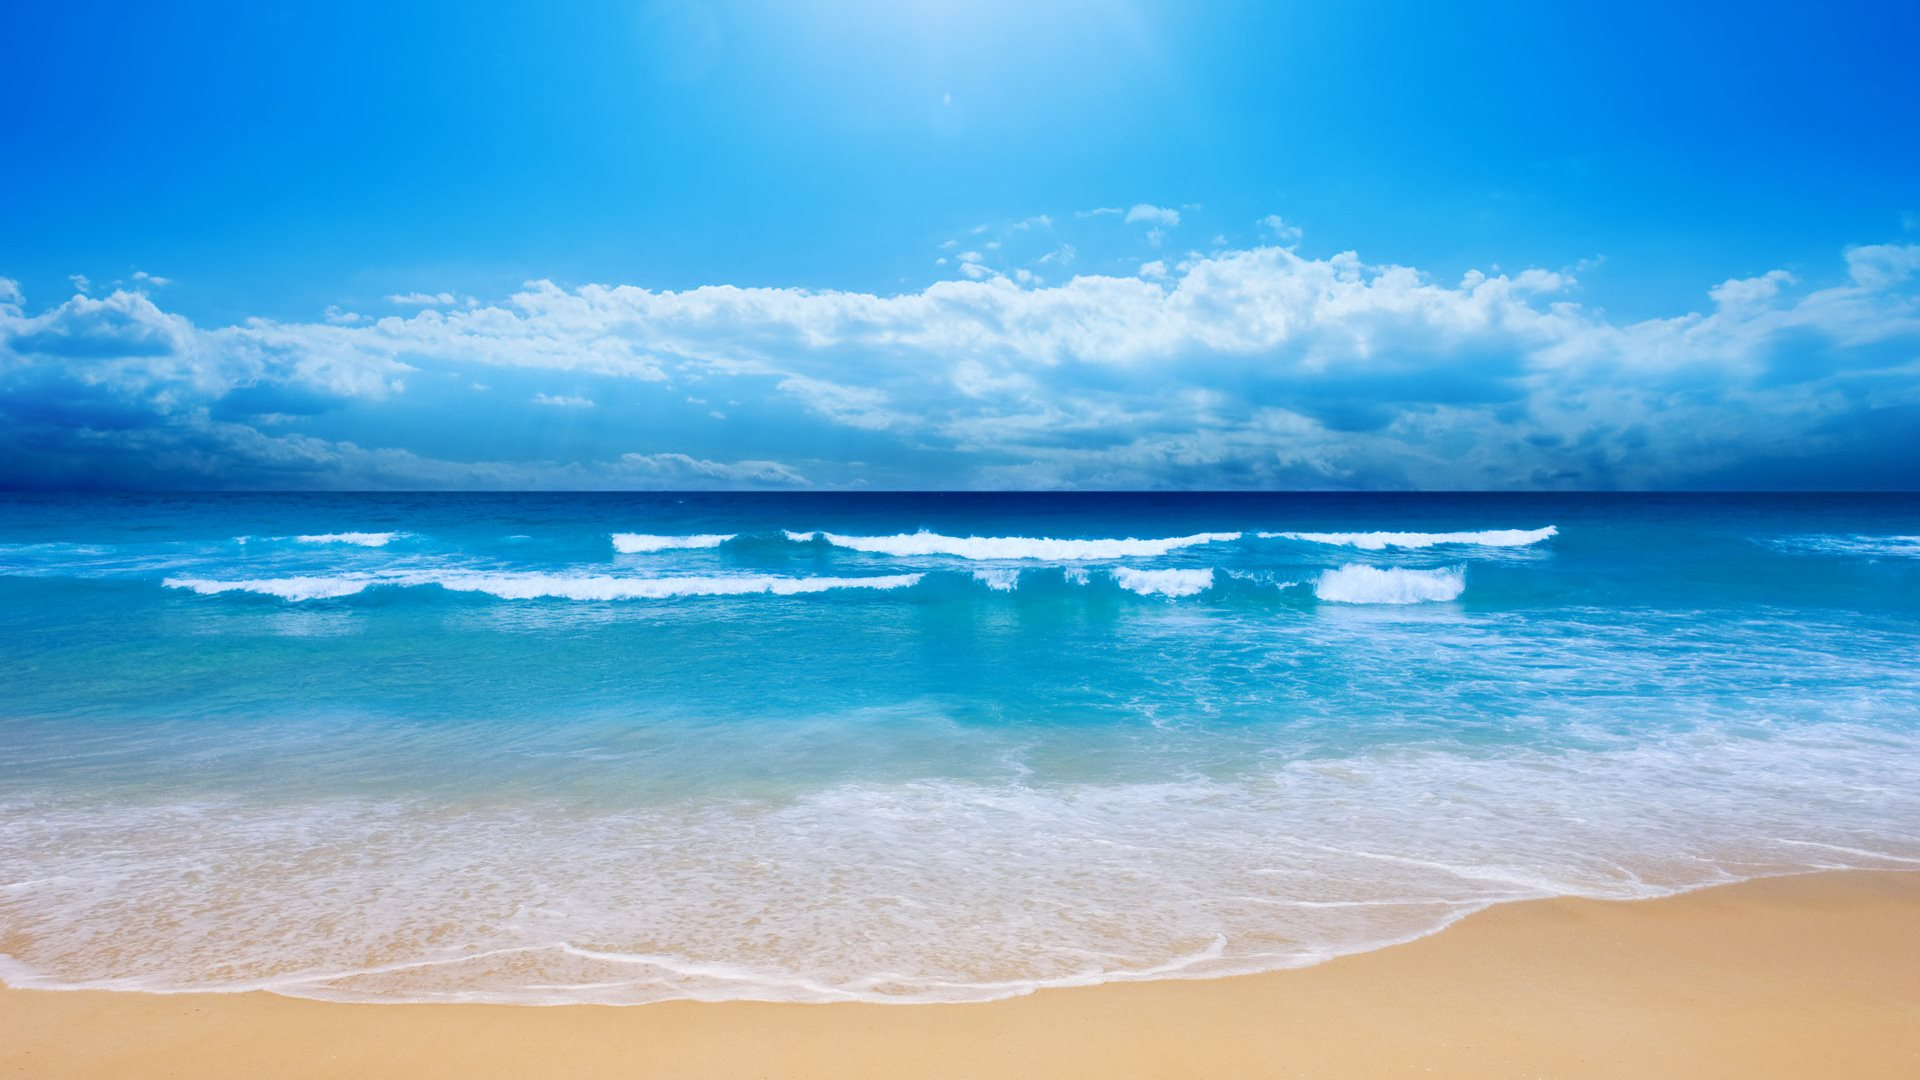 blue sea waves wallpaper